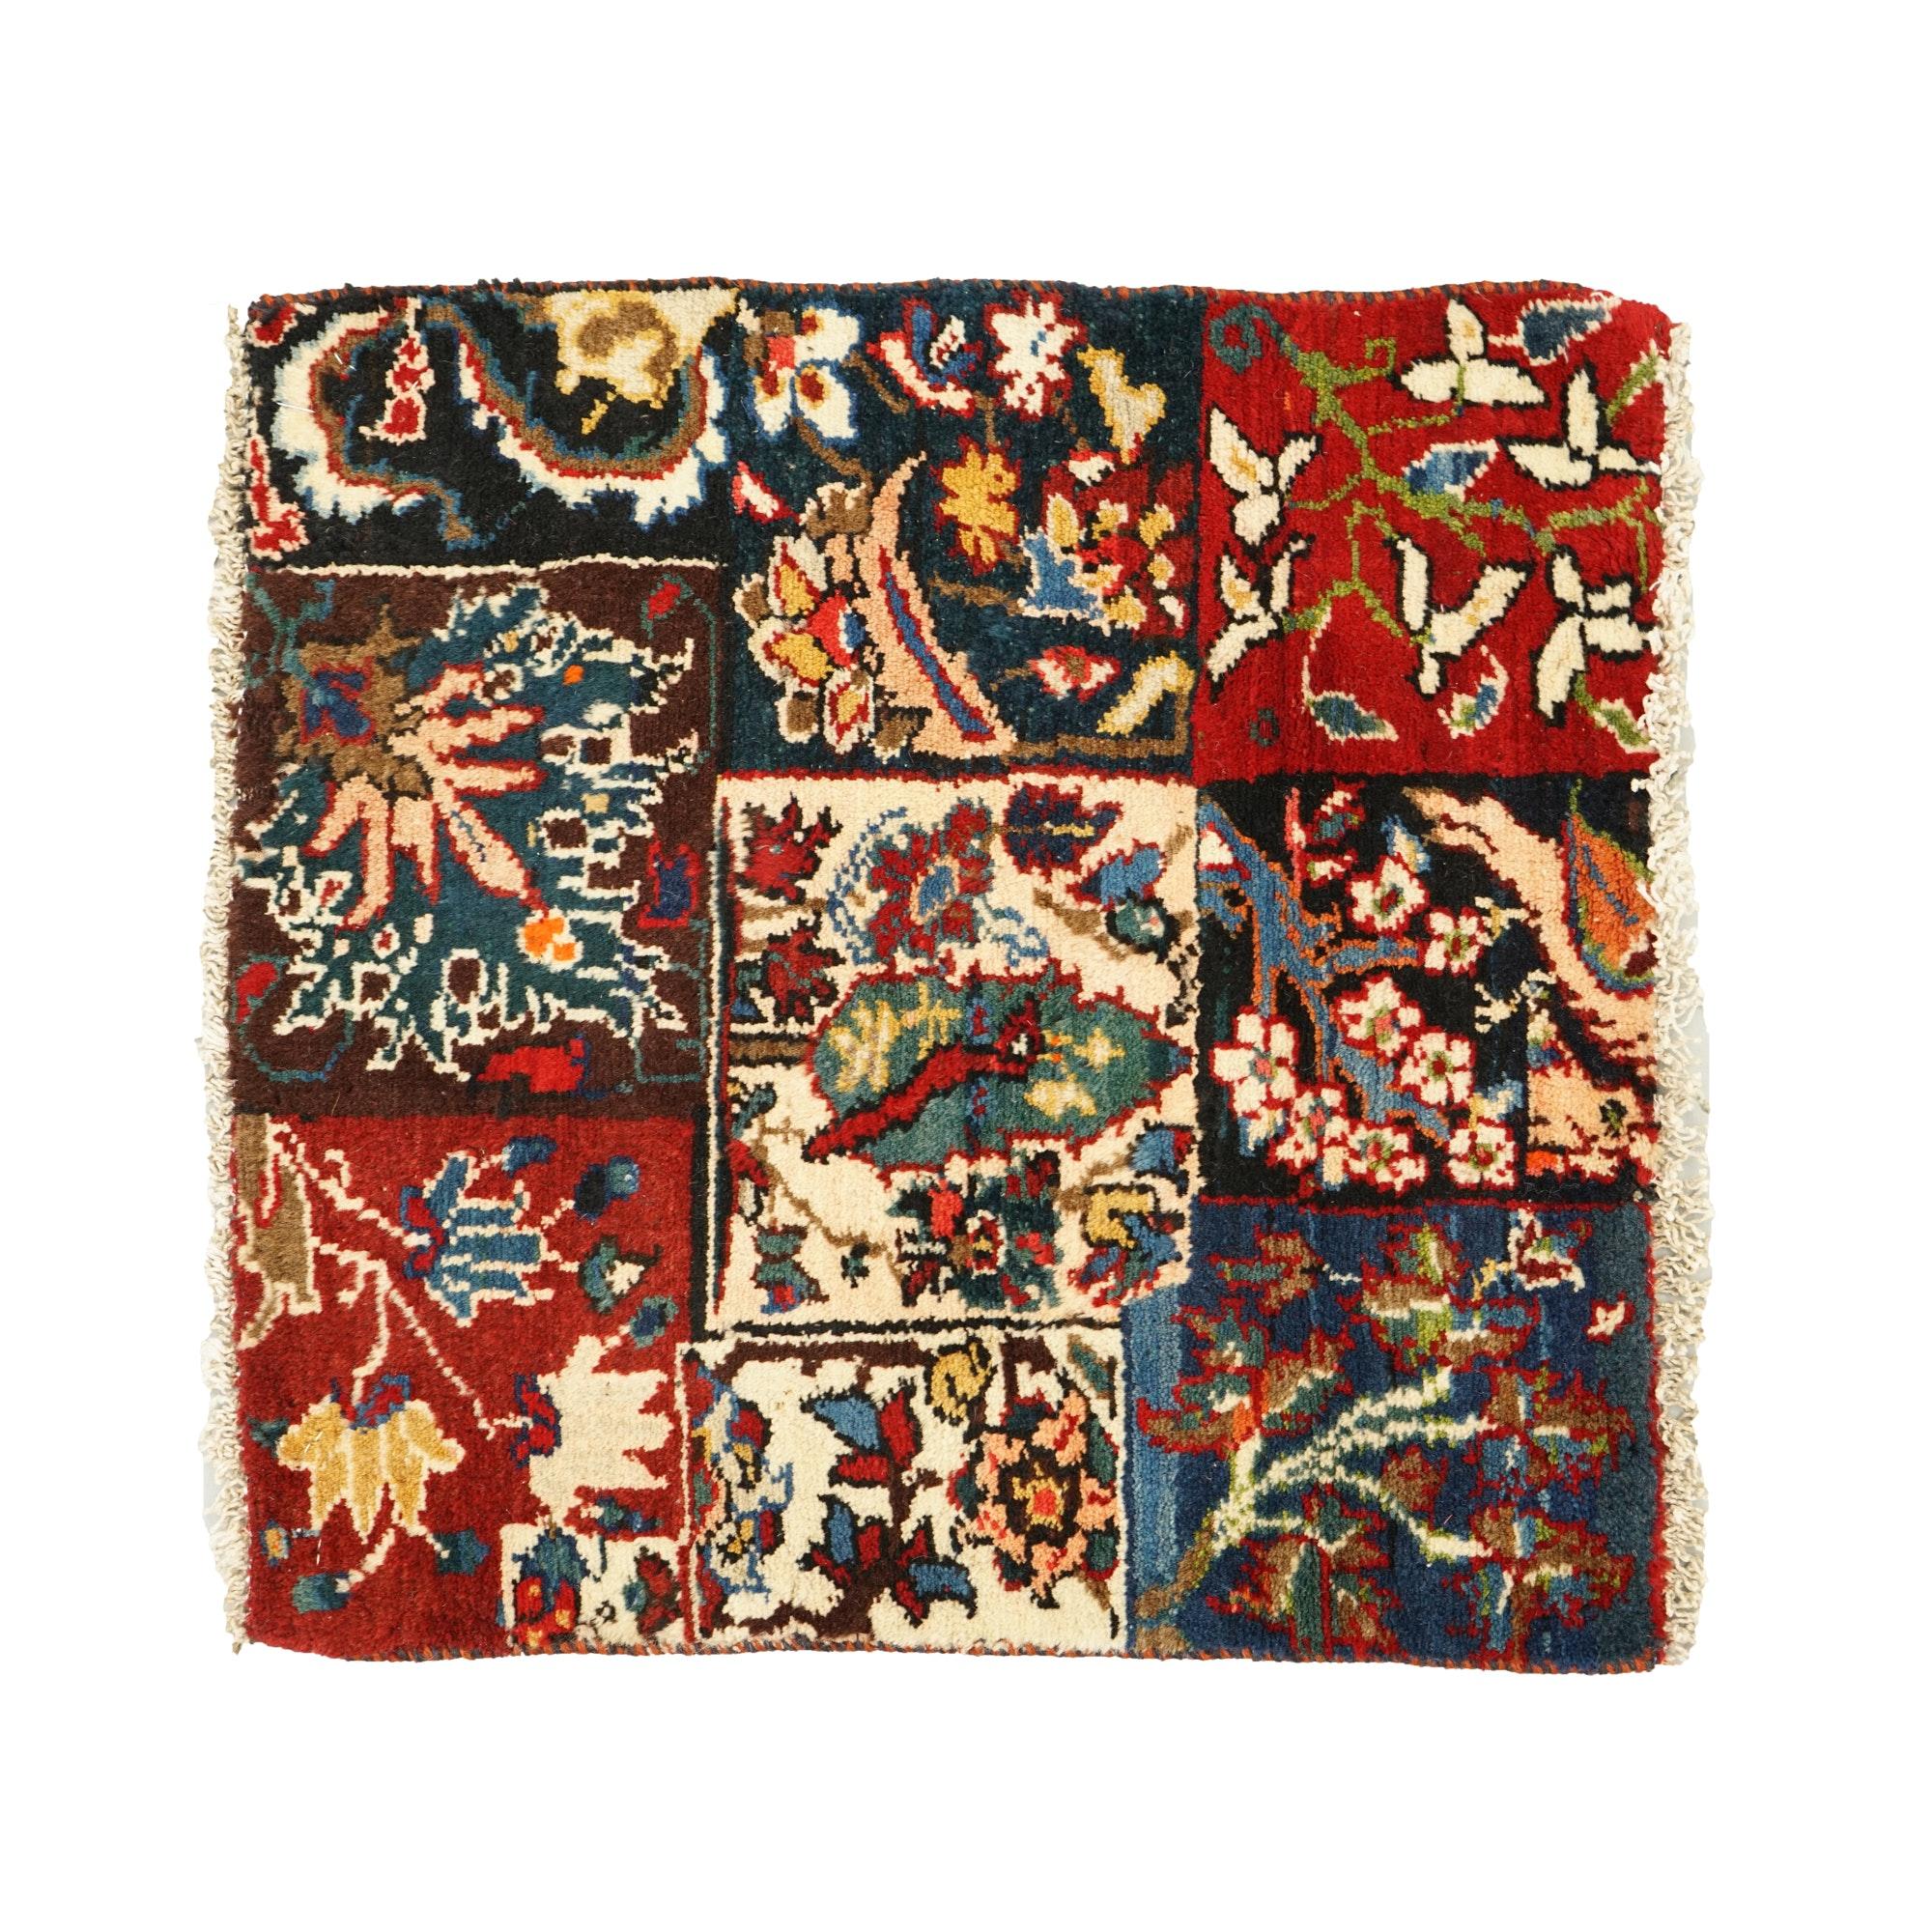 Hand-Knotted Persian Qashqai Wool Mat